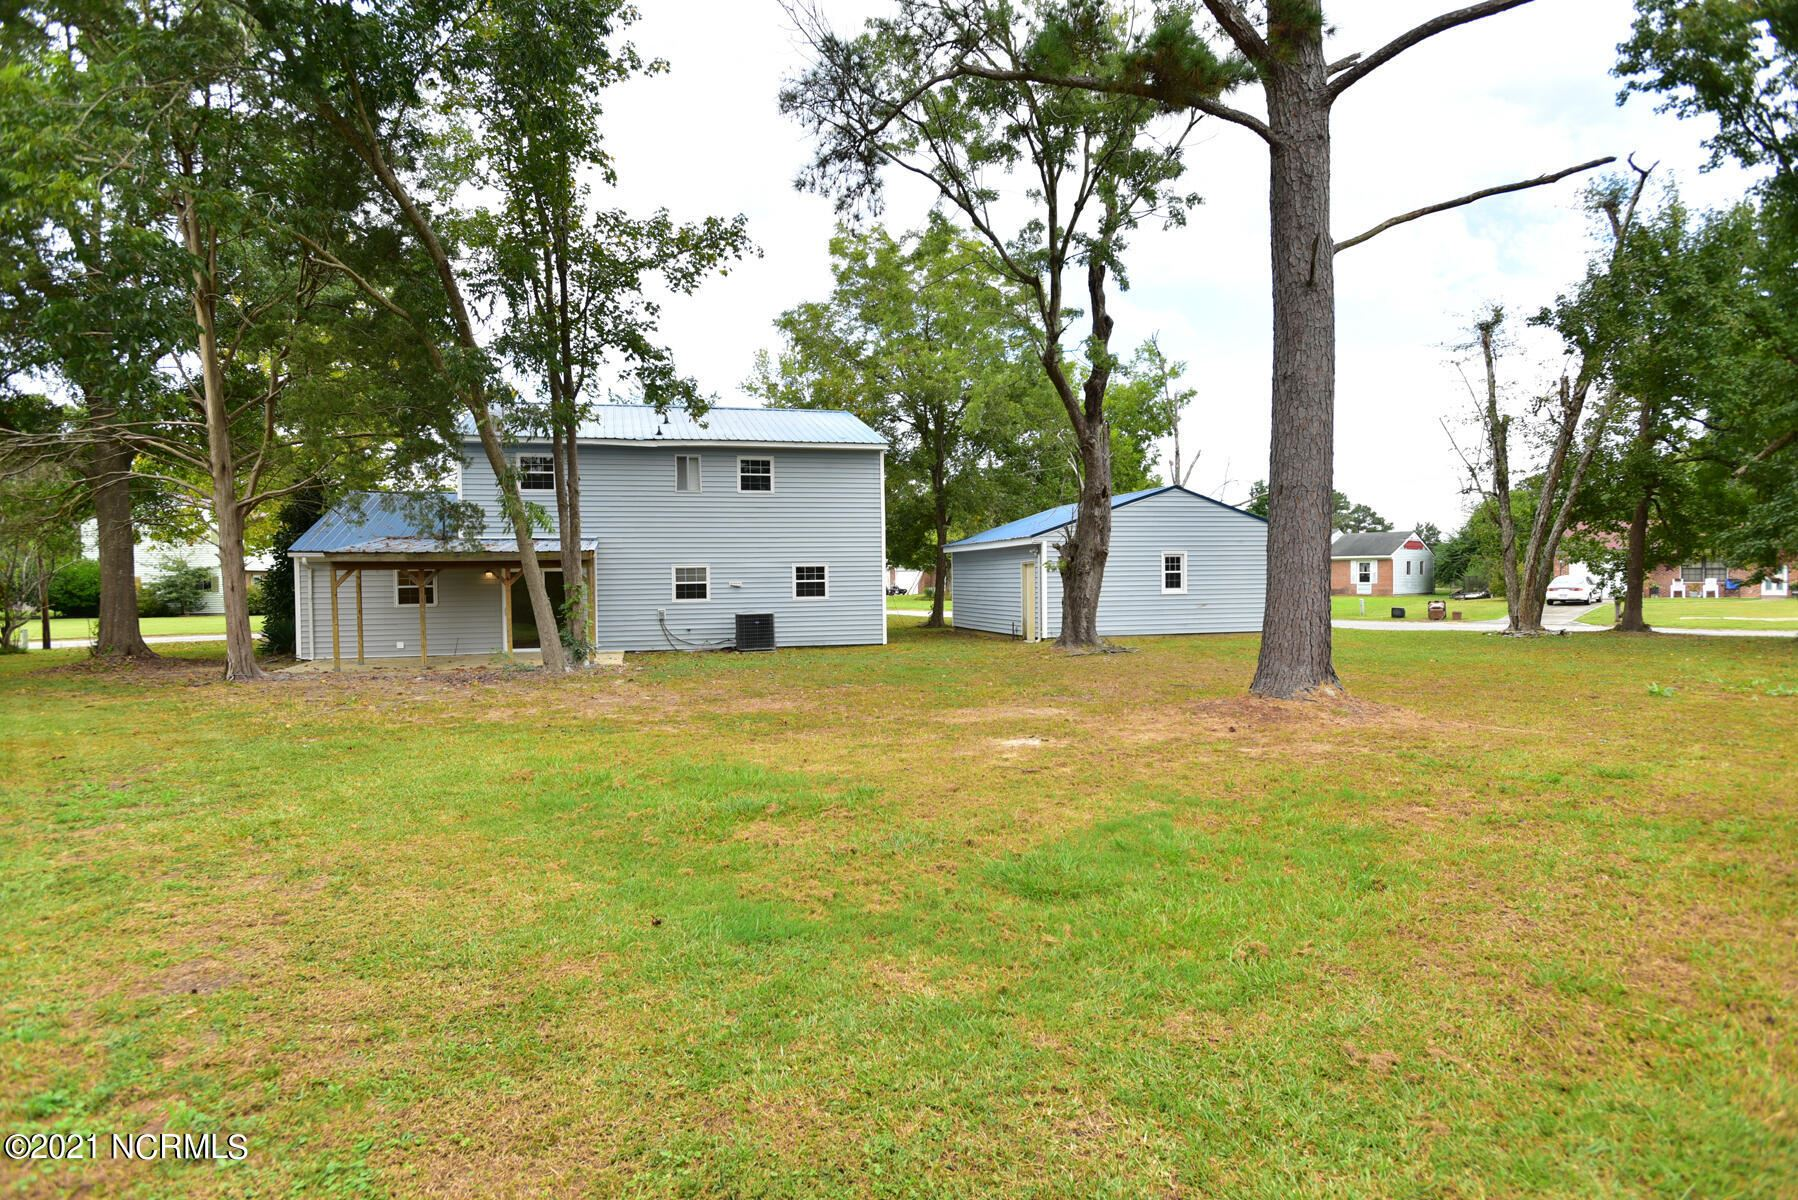 Photo of 1214 Castle Drive, Jacksonville, NC 28546 (MLS # 100294189)